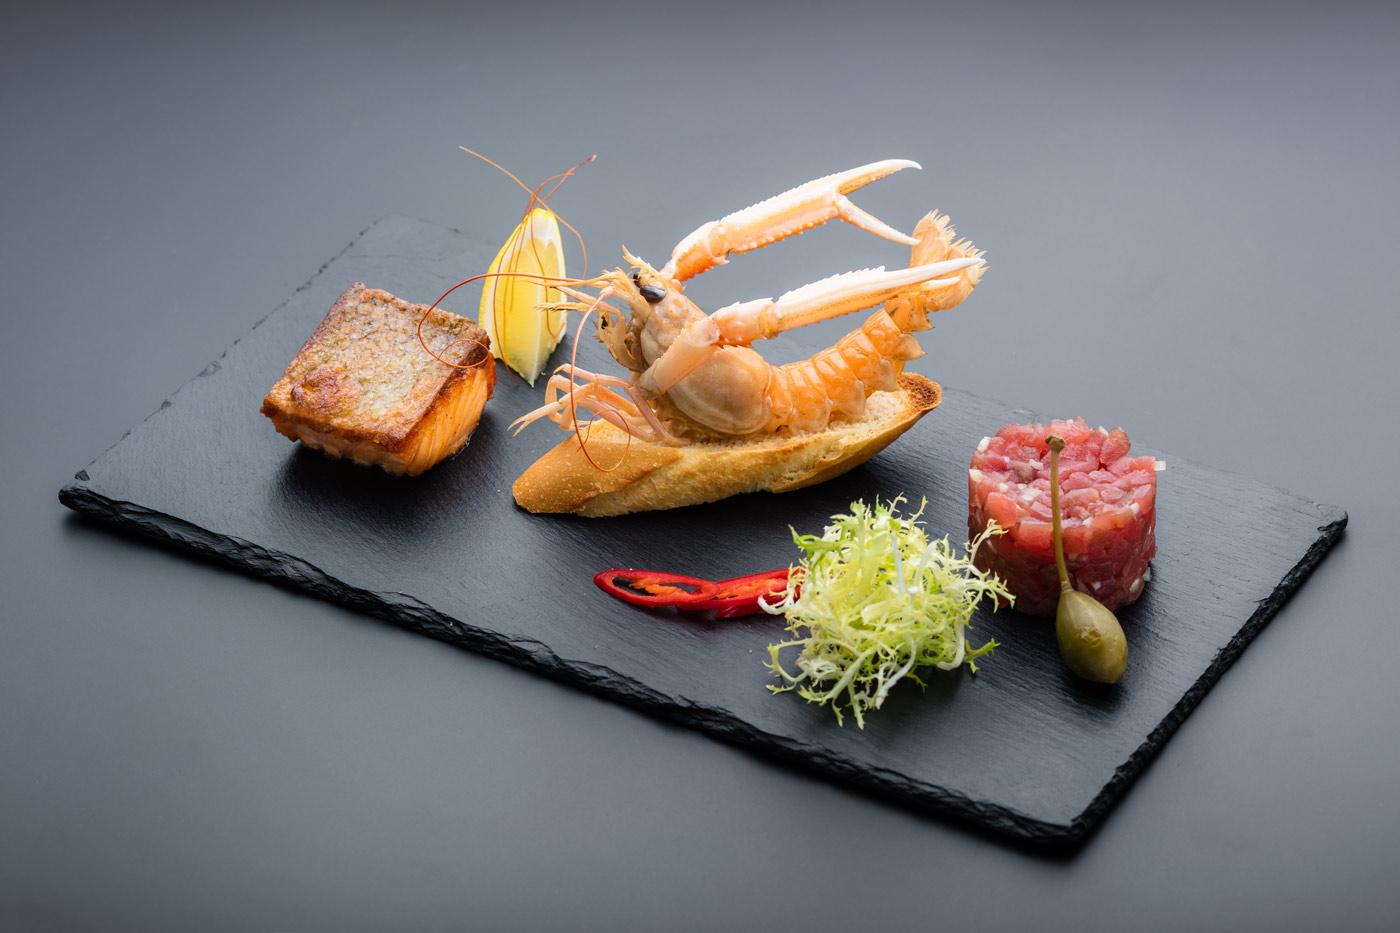 Plate with salmon, prawn and salmon tartar